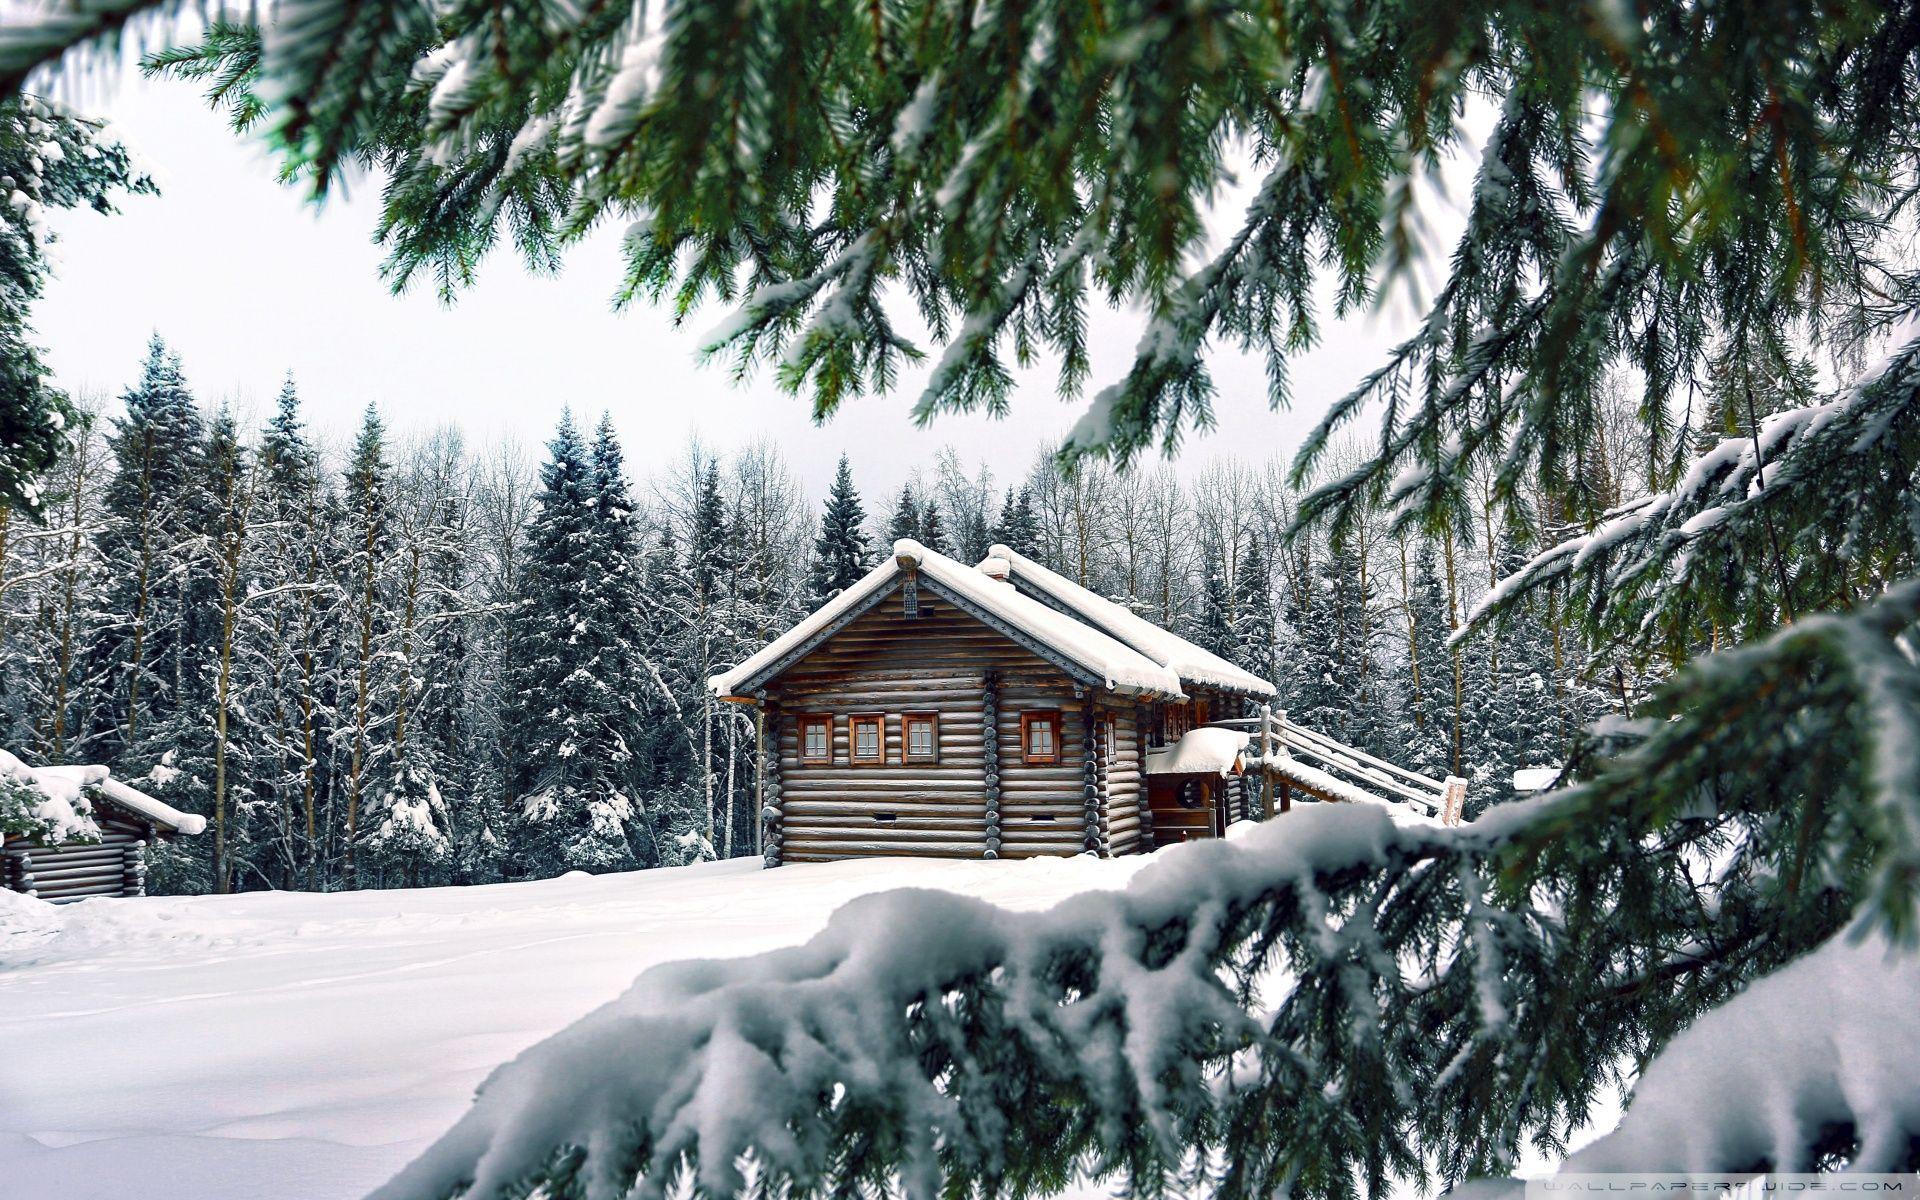 Mountain Retreat Winter Winter house Winter cabin Cabins in 1920x1200